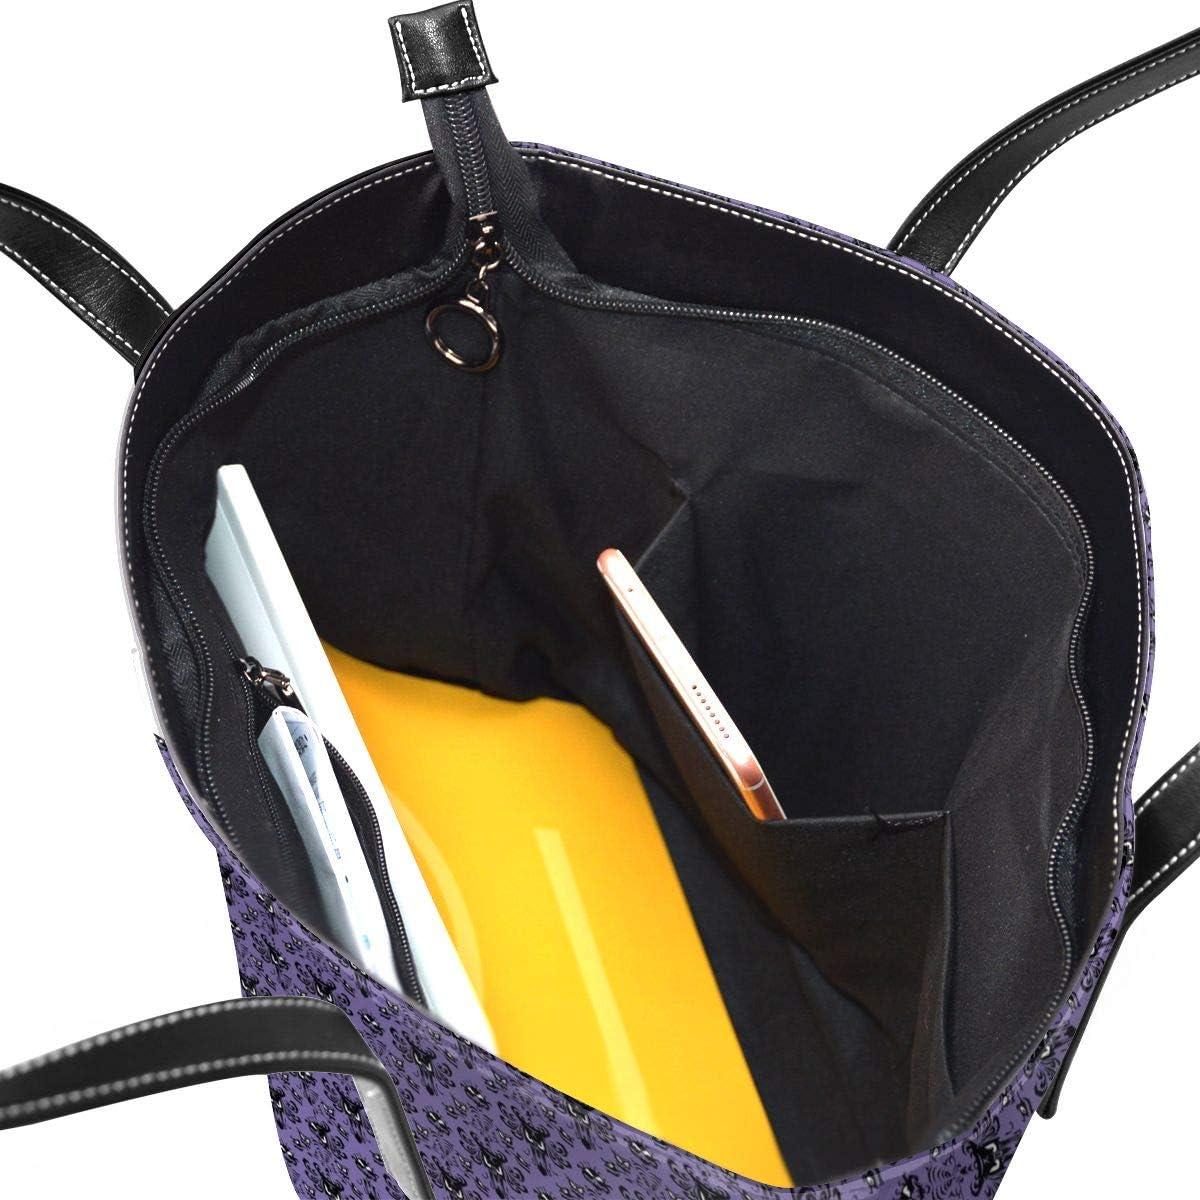 M009USFA Haunted Mansion Tote Handbag Daily Bag Beach Tote Shopper School Gym Travel Bag